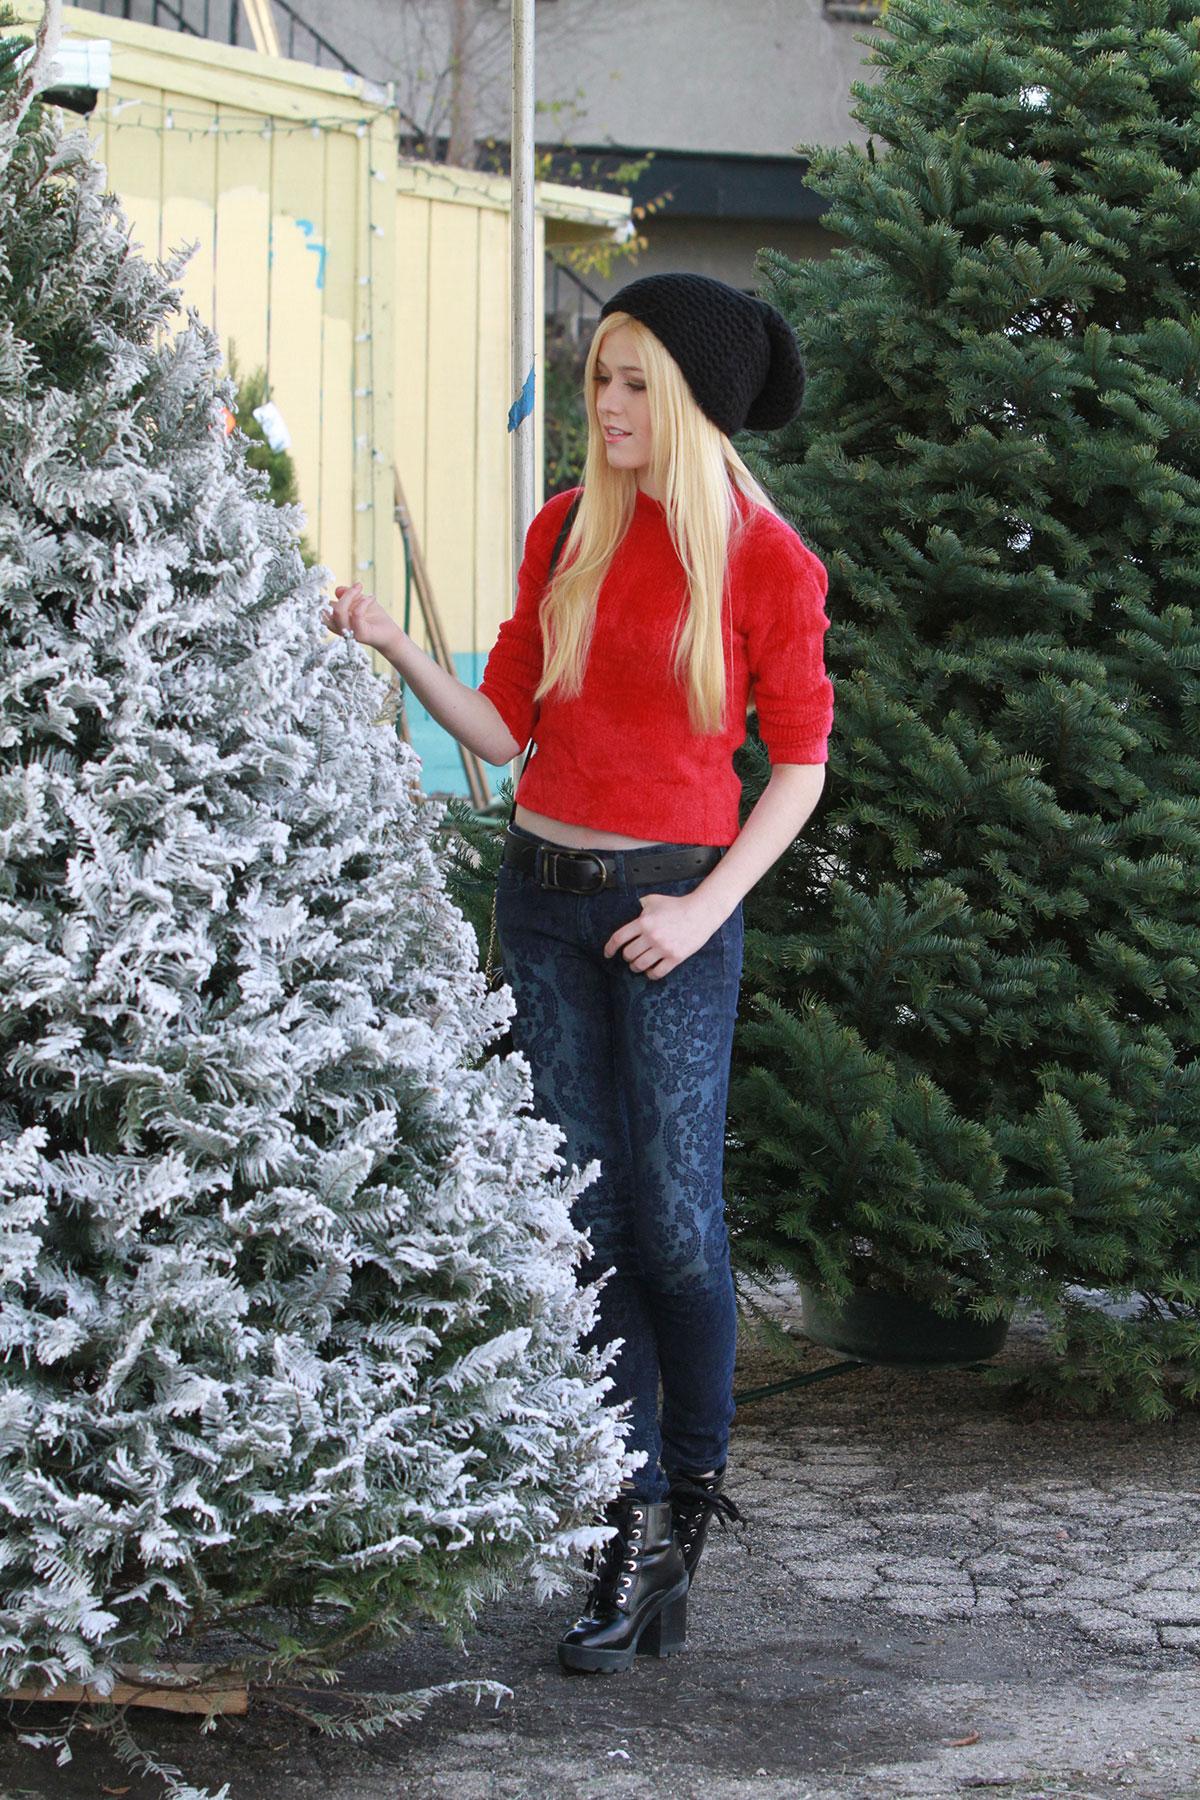 katherine mcnamara shopping a christmas tree in los angeles - Christmas Tree Shopping